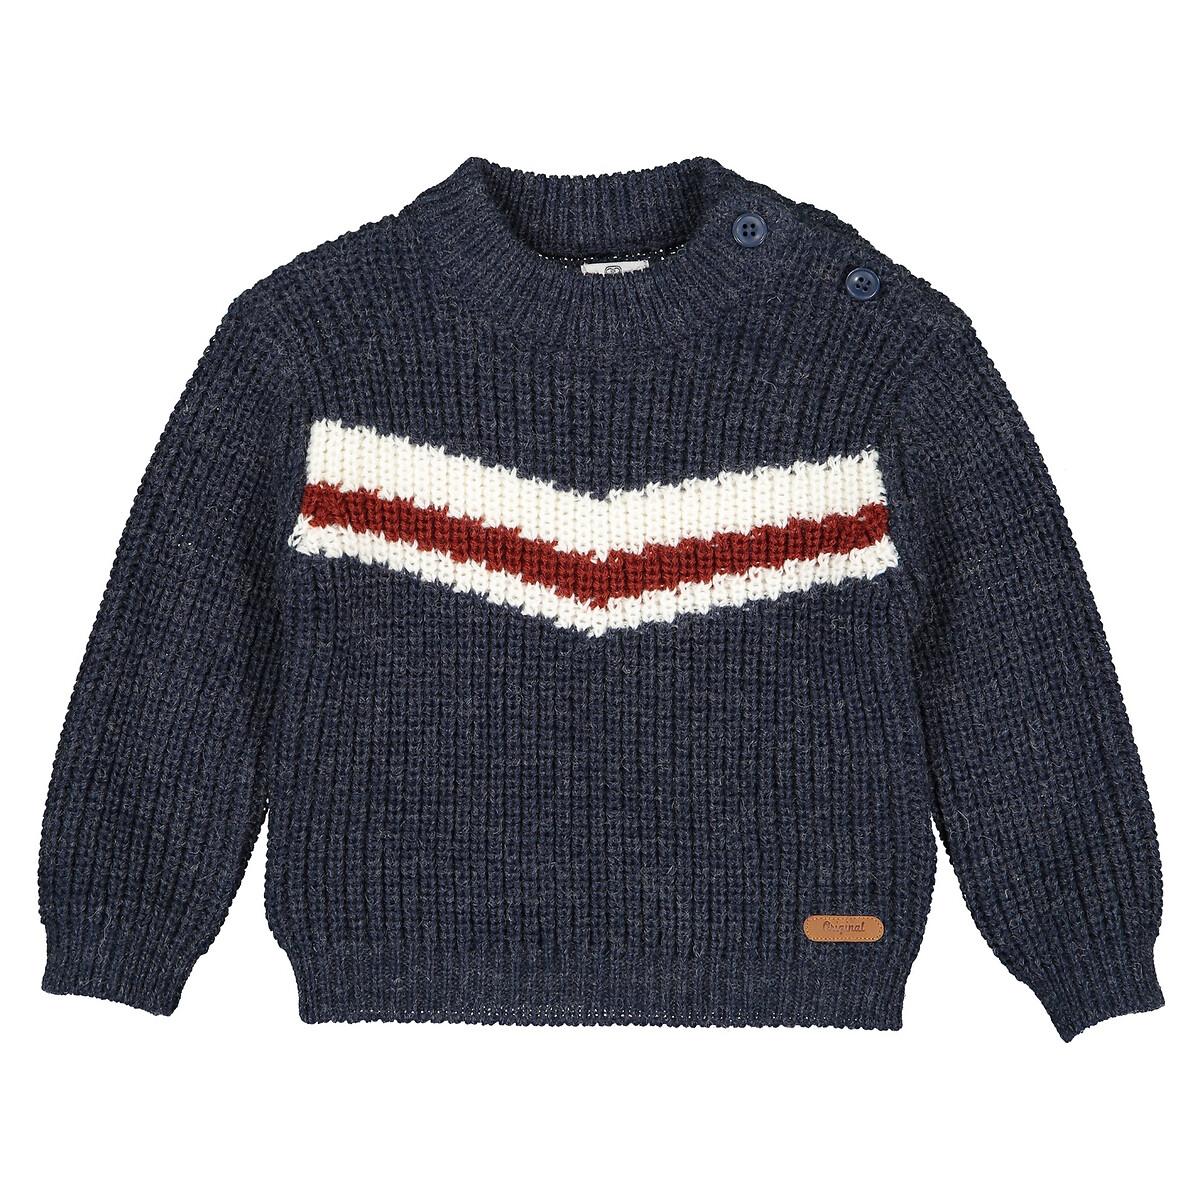 Фото - Пуловер LaRedoute С круглым вырезом из трикотажа крупной вязки 1 мес-4 года 1 мес. - 54 см синий пуловер laredoute крупной вязки s синий